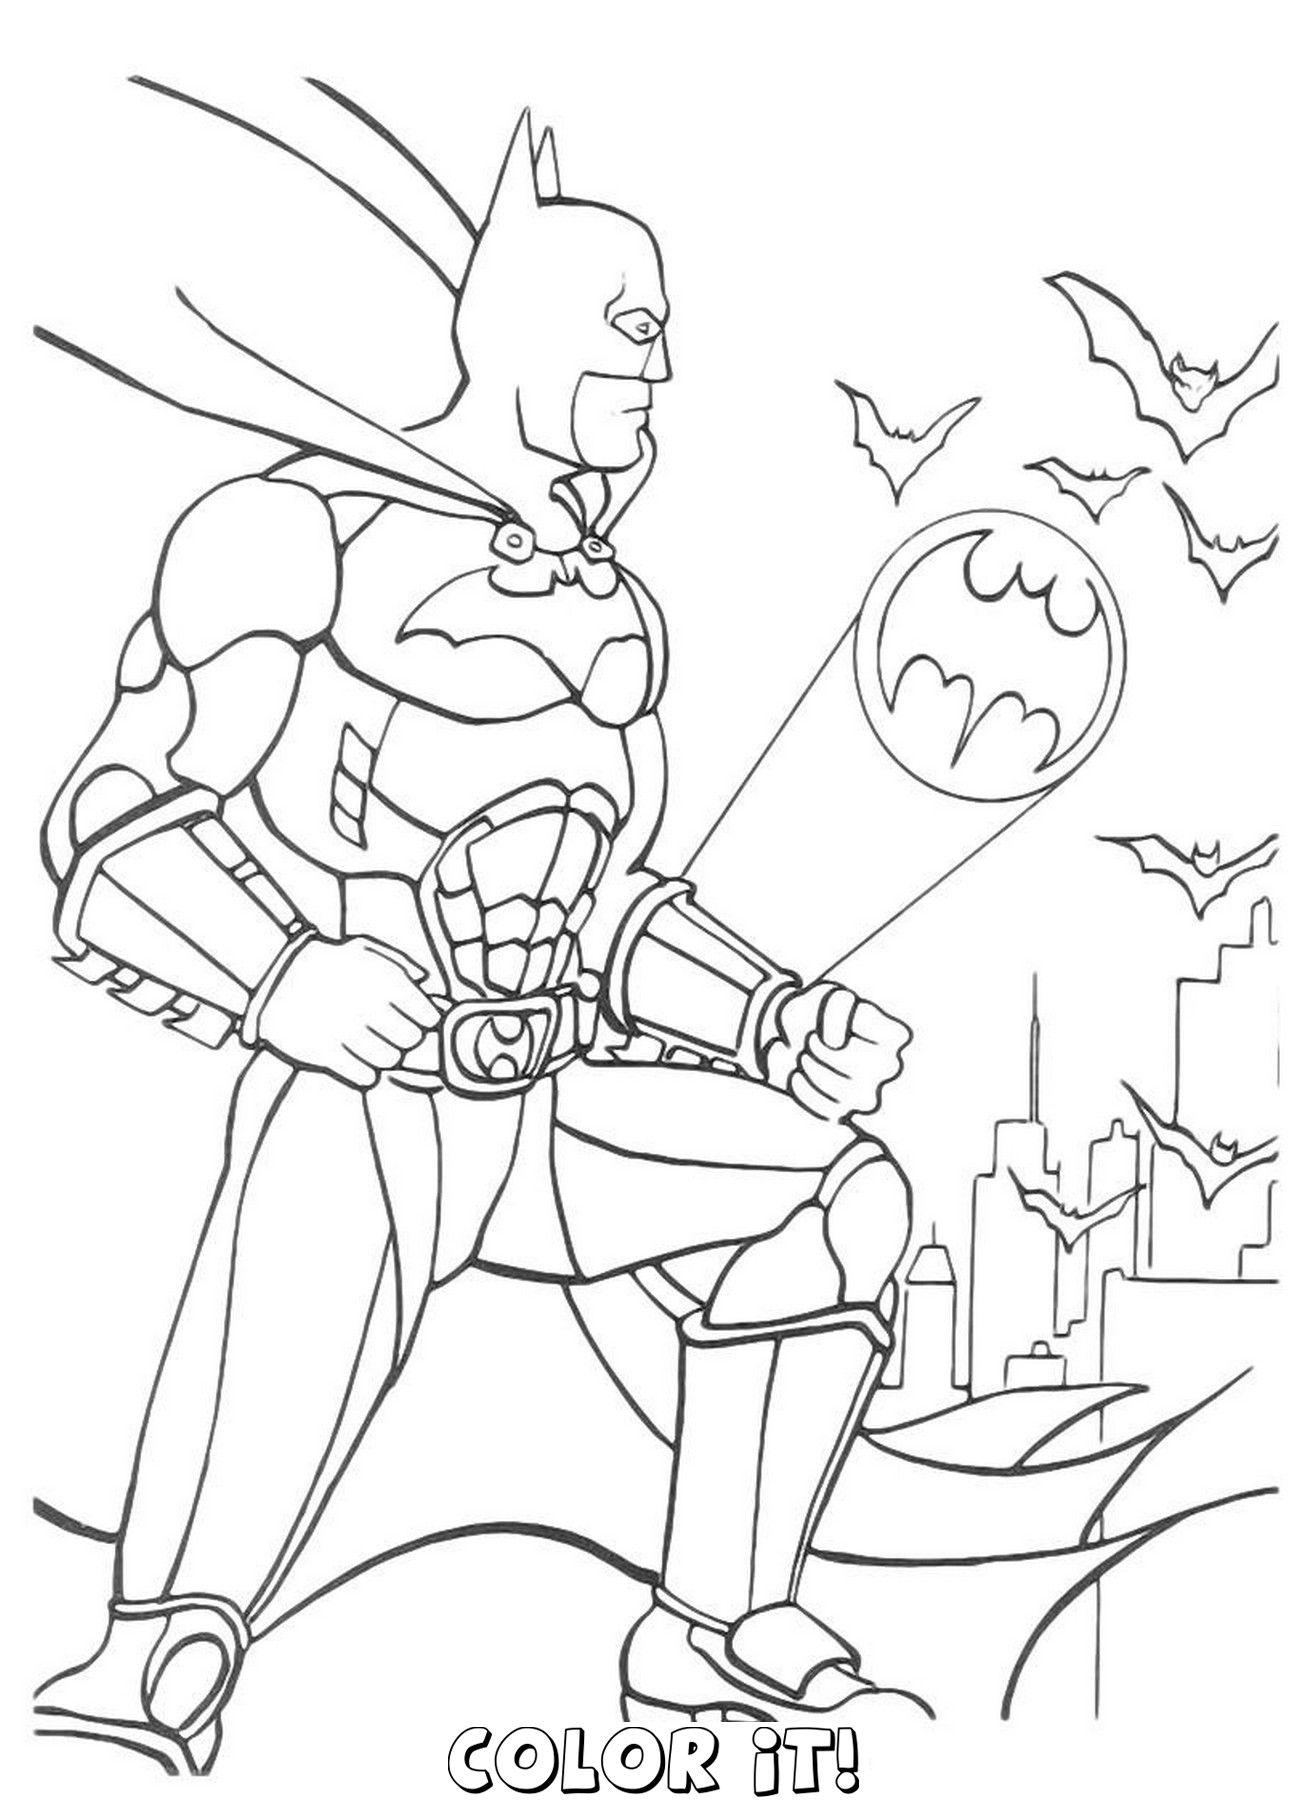 Batman and robin coloring pages Boyama sayfaları, Sanat